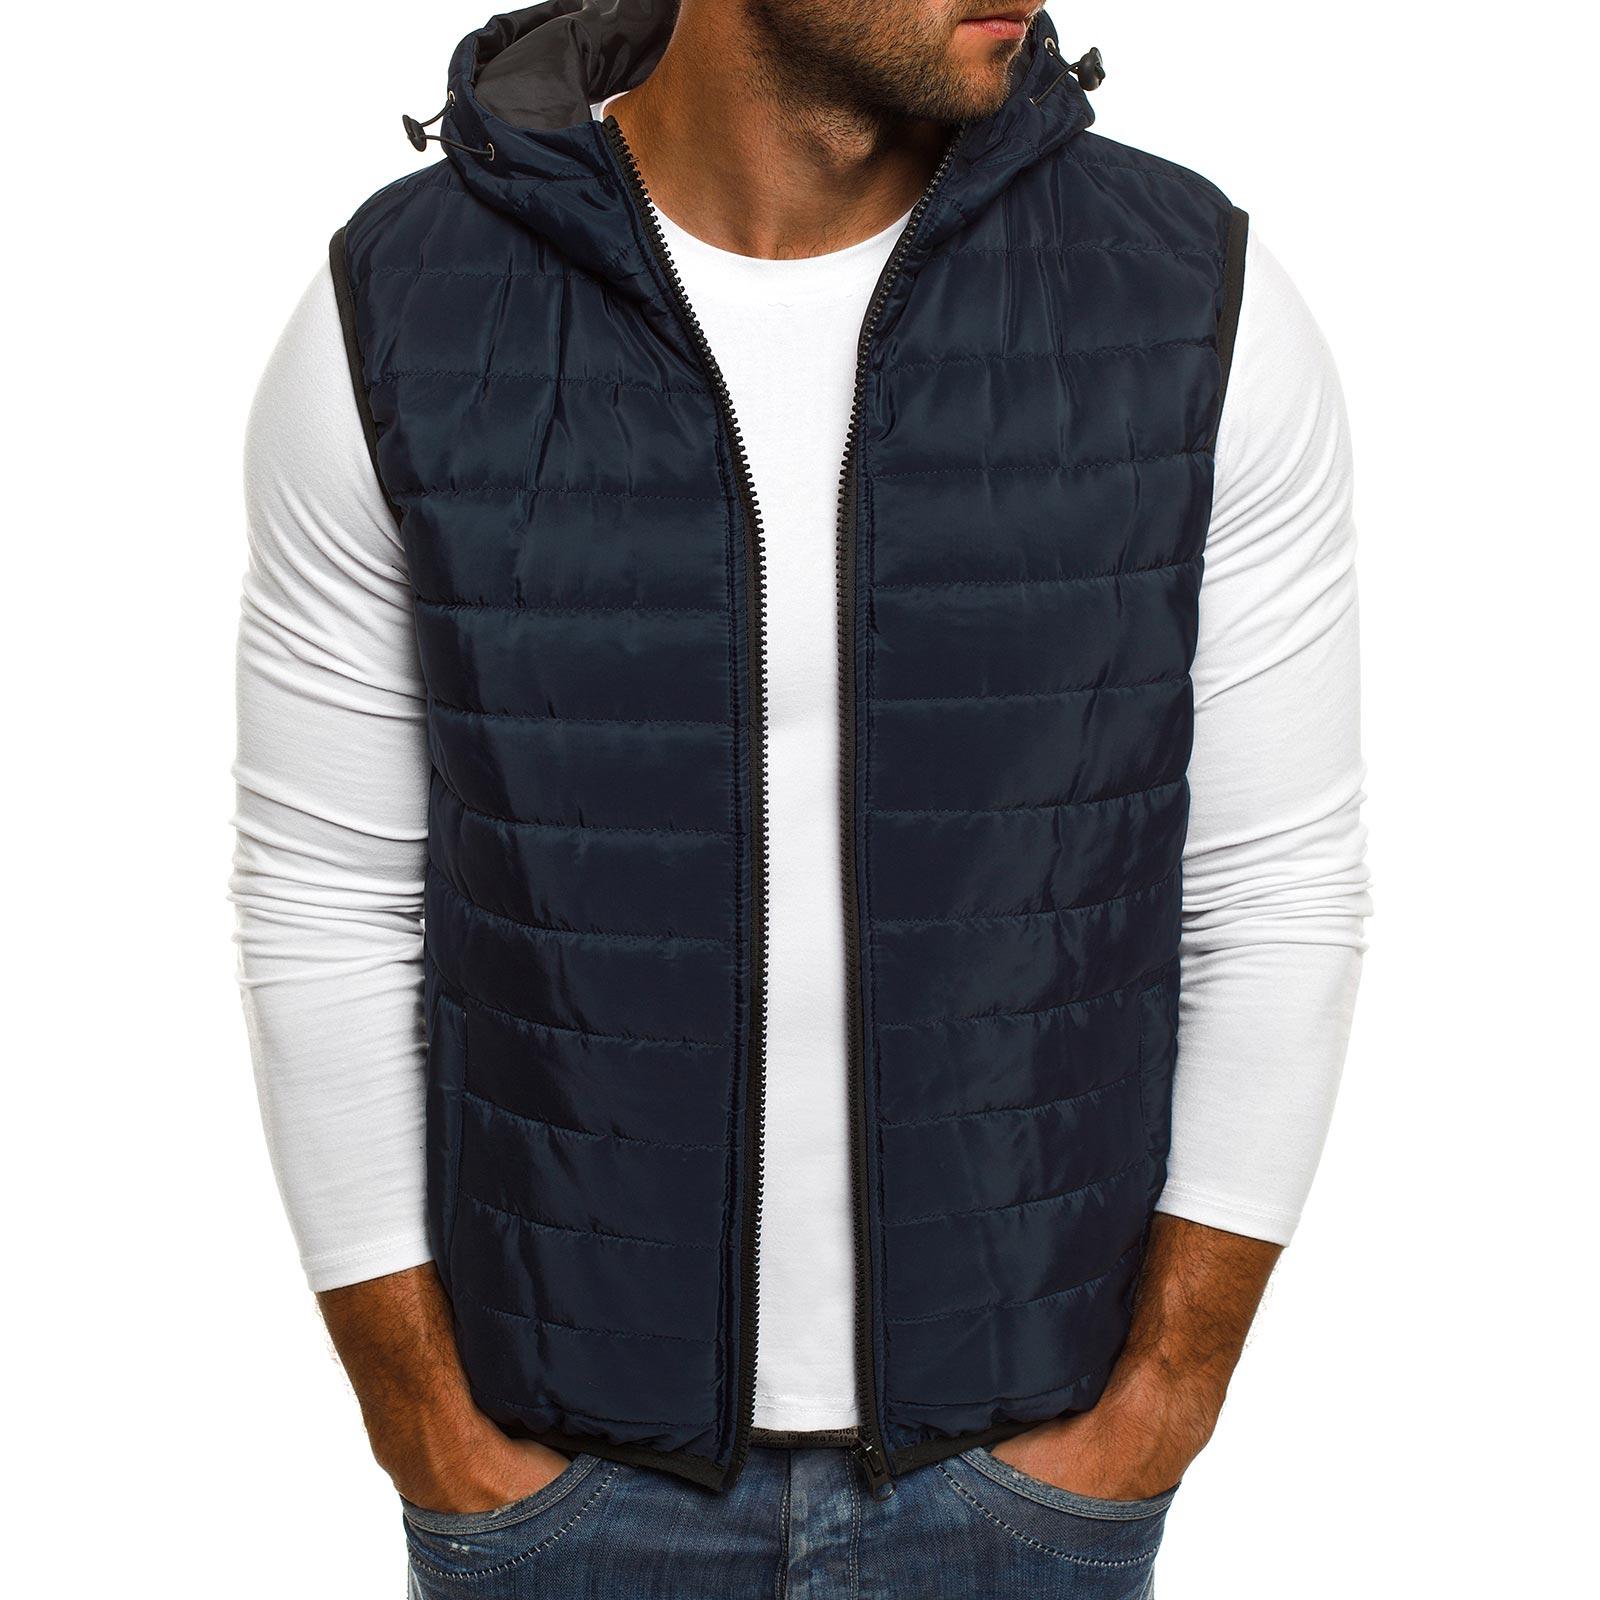 ZOGAA Vest Men New Stylish 2019 Spring Autumn Warm Sleeveless Jacket Men Winter Waistcoat Men's Vest Casual Coats Mens Mens Vest